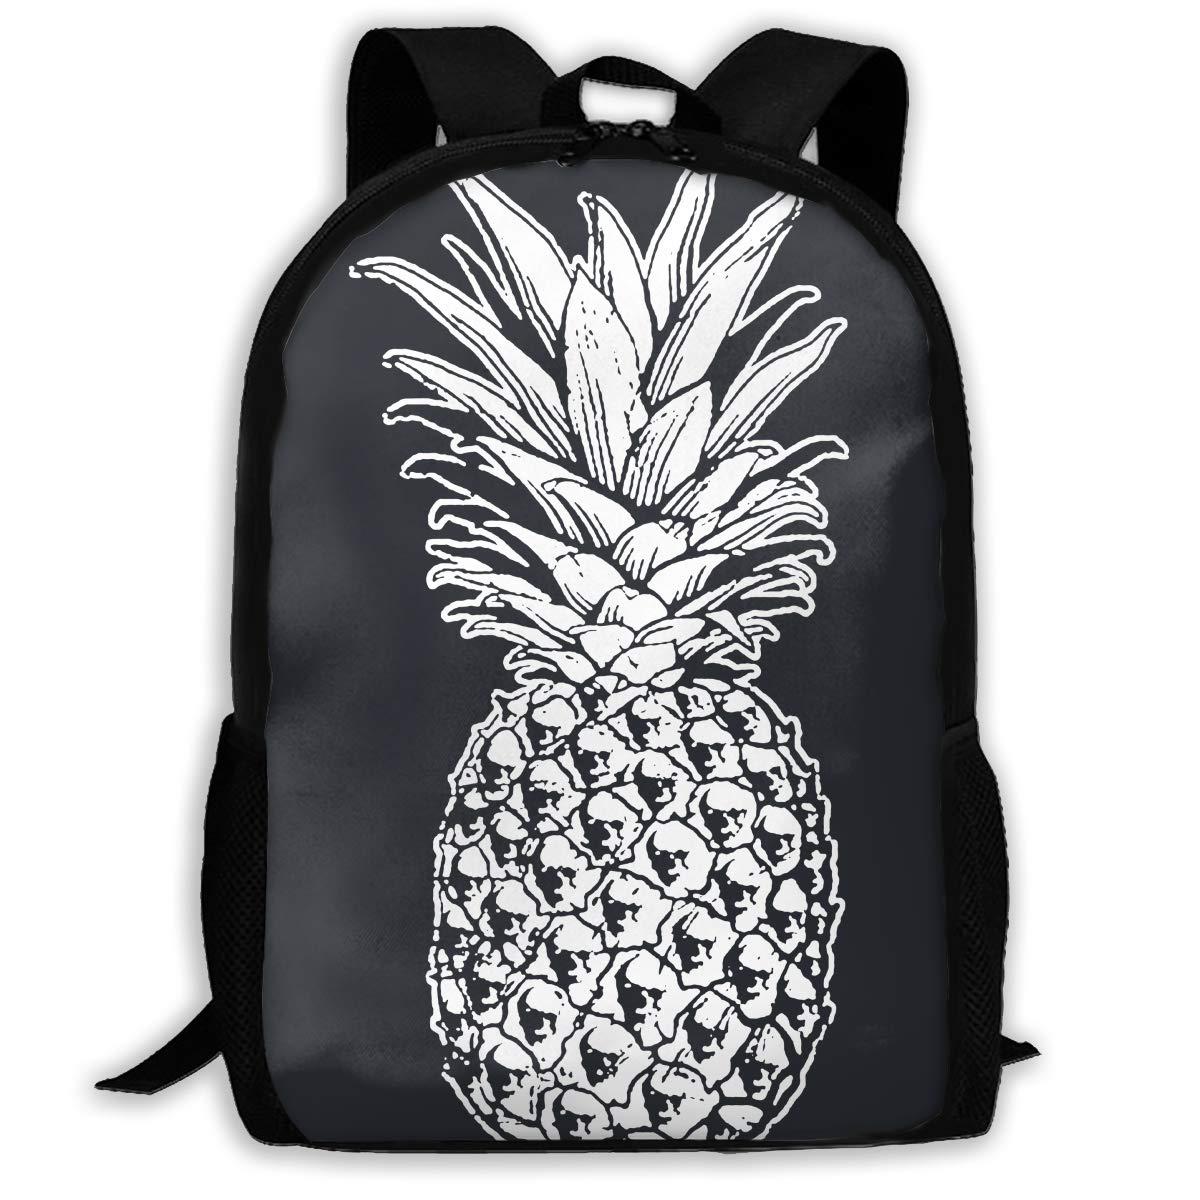 Dolores Marguerite スカルパイナップルバックパック 防水 軽量 ハイキング デイパック One Size ブラック backpack-4262427-Black-48 One Size ブラック B07JL5R8P6